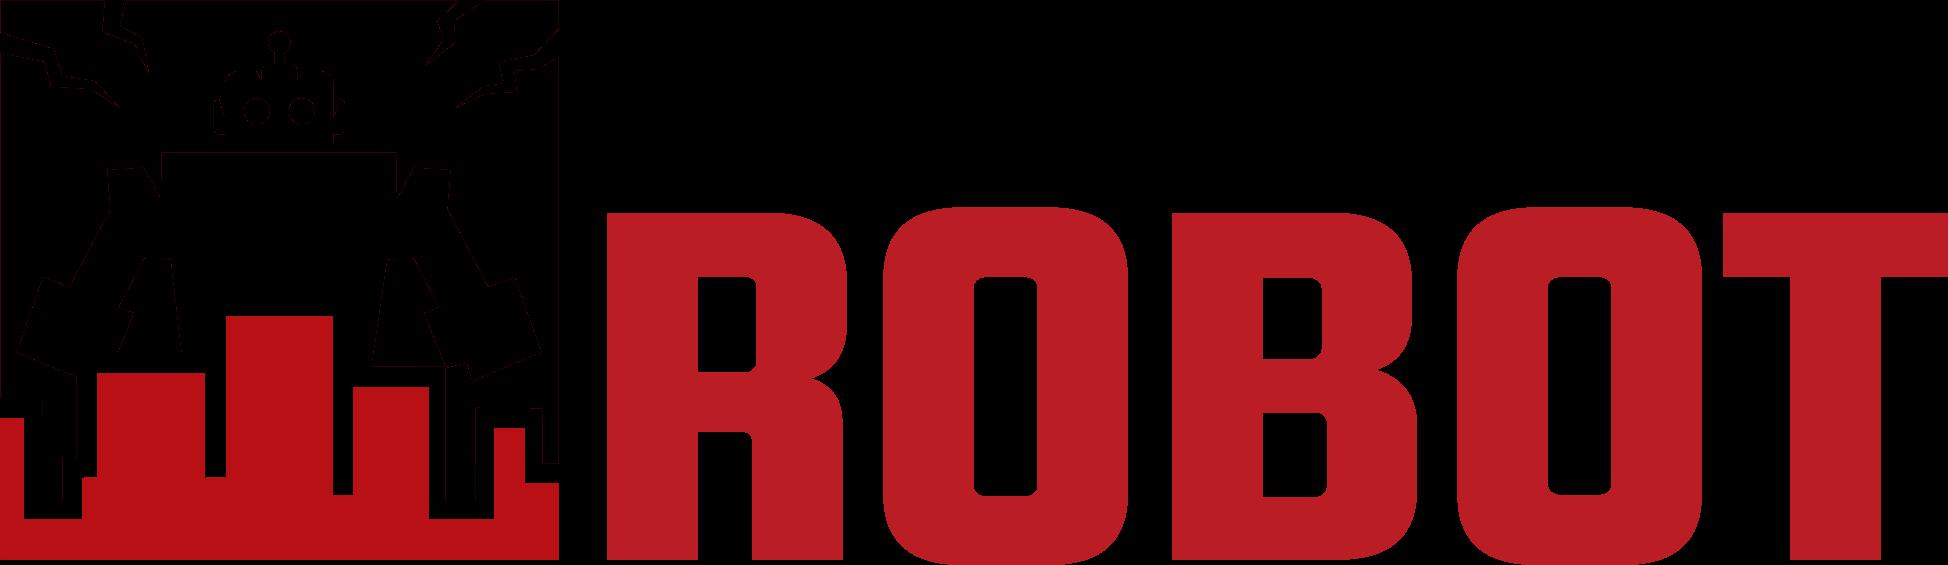 GFR-black-red-hori